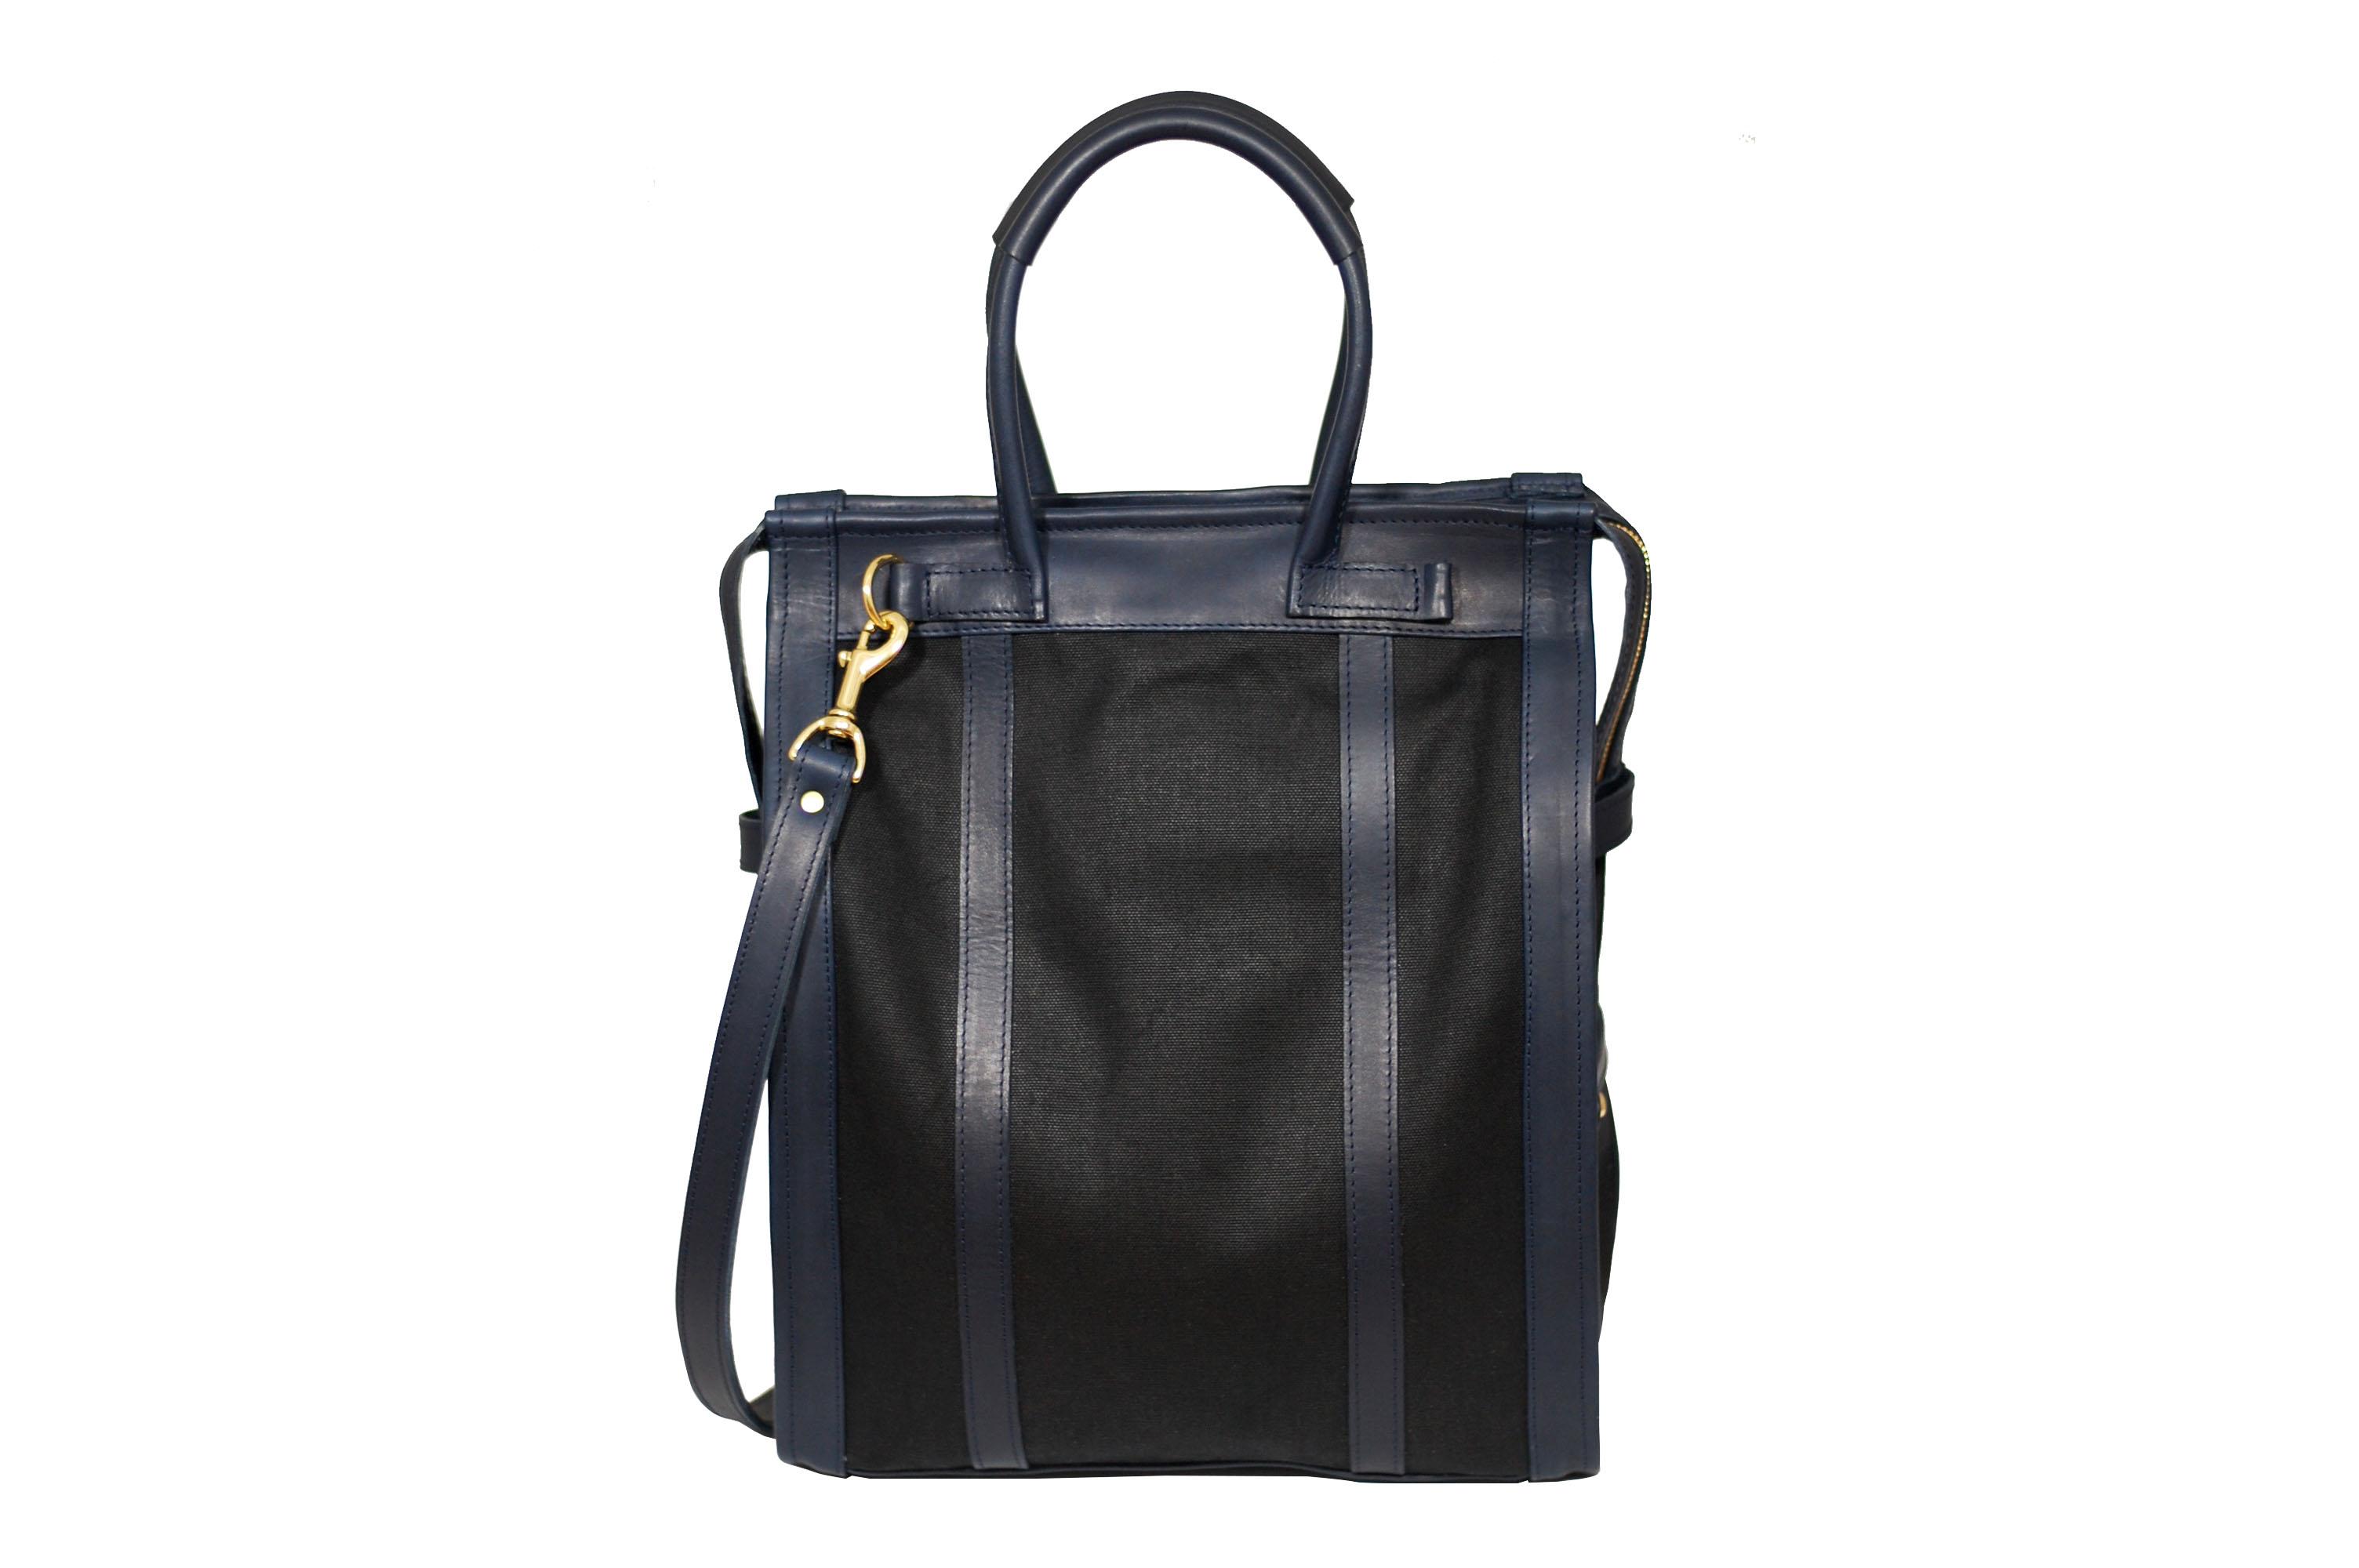 Mahiout field companion bag, luxury designer bag